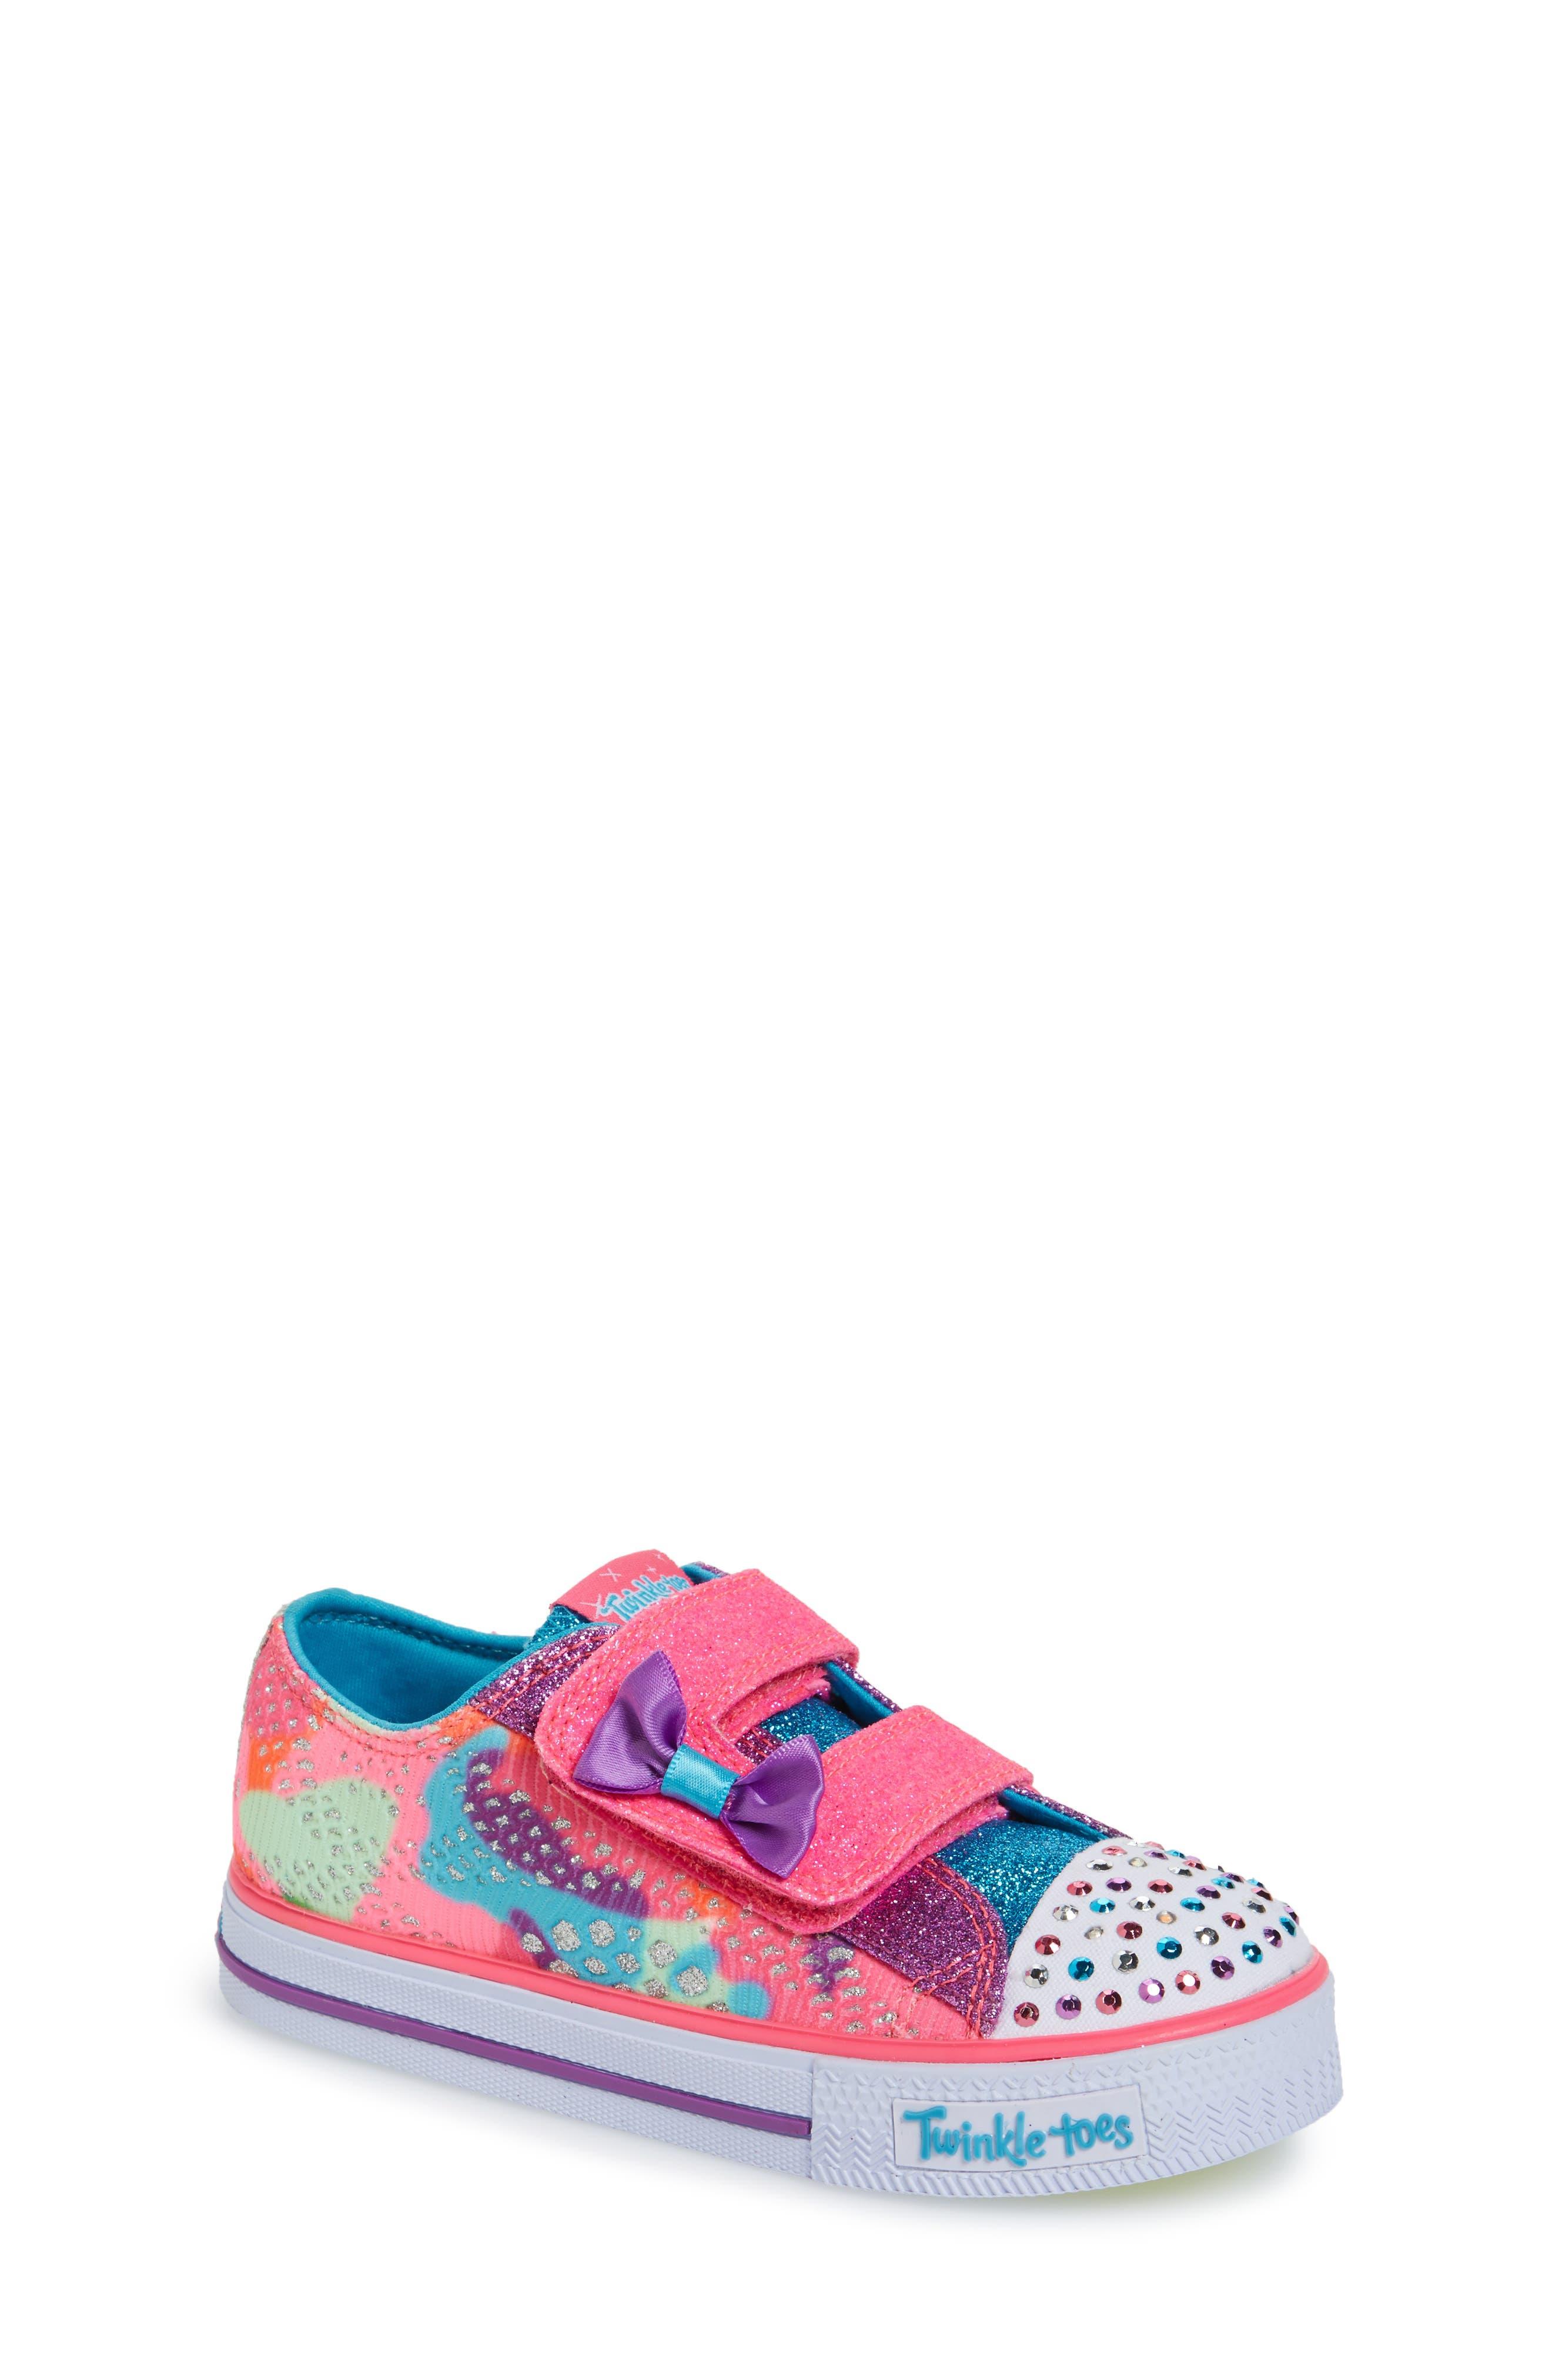 Main Image - SKECHERS Twinkle Toes Shuffles Light-Up Sneaker (Walker & Toddler)